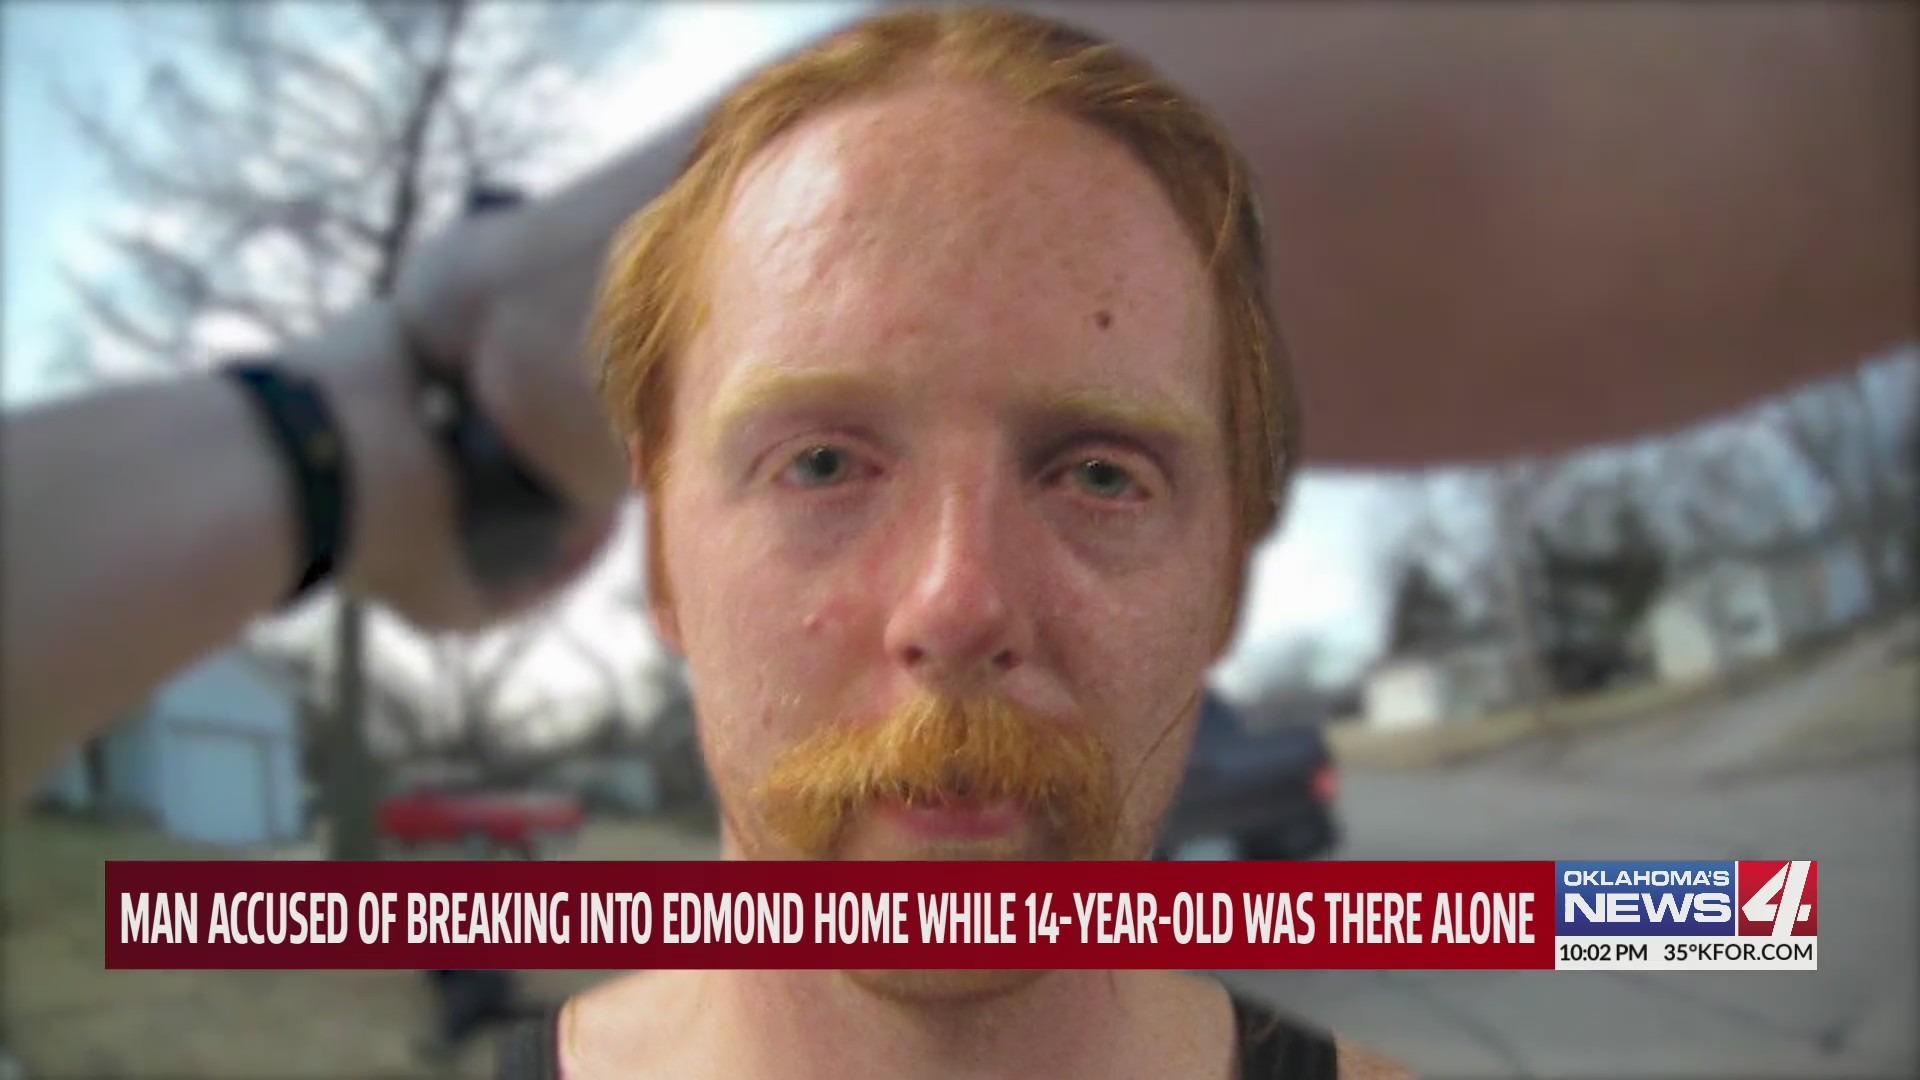 I Was Shaking 14 Year Old Home Alone In Edmond When Alleged Drunk Burglar Busts Through Window Kfor Com Oklahoma City